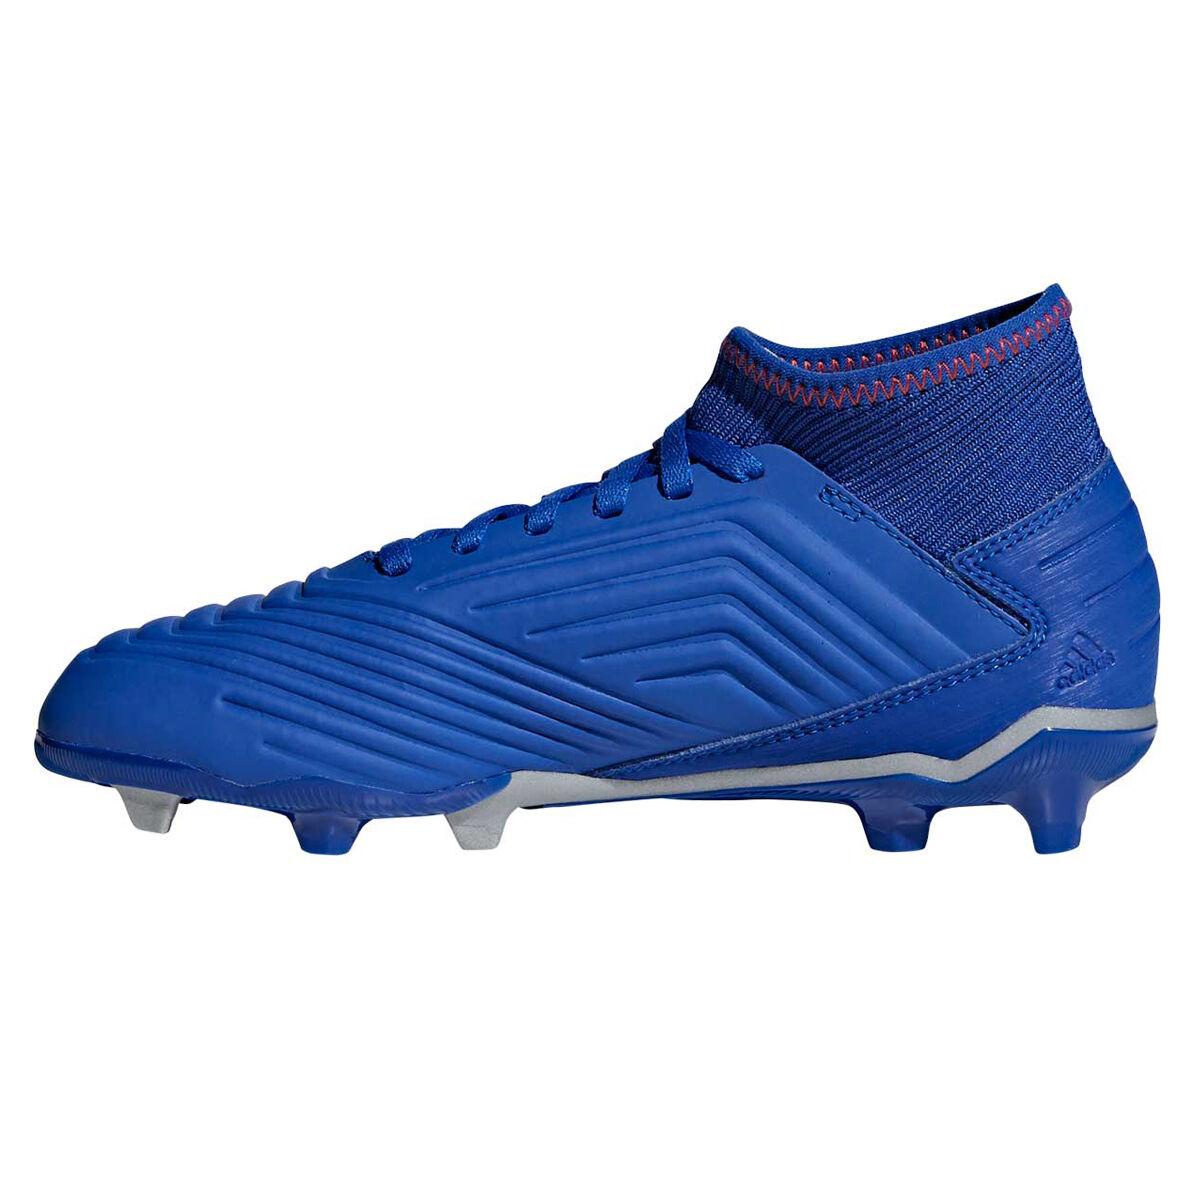 Reliable Adidas Originals Boots Blue Children Dragon J